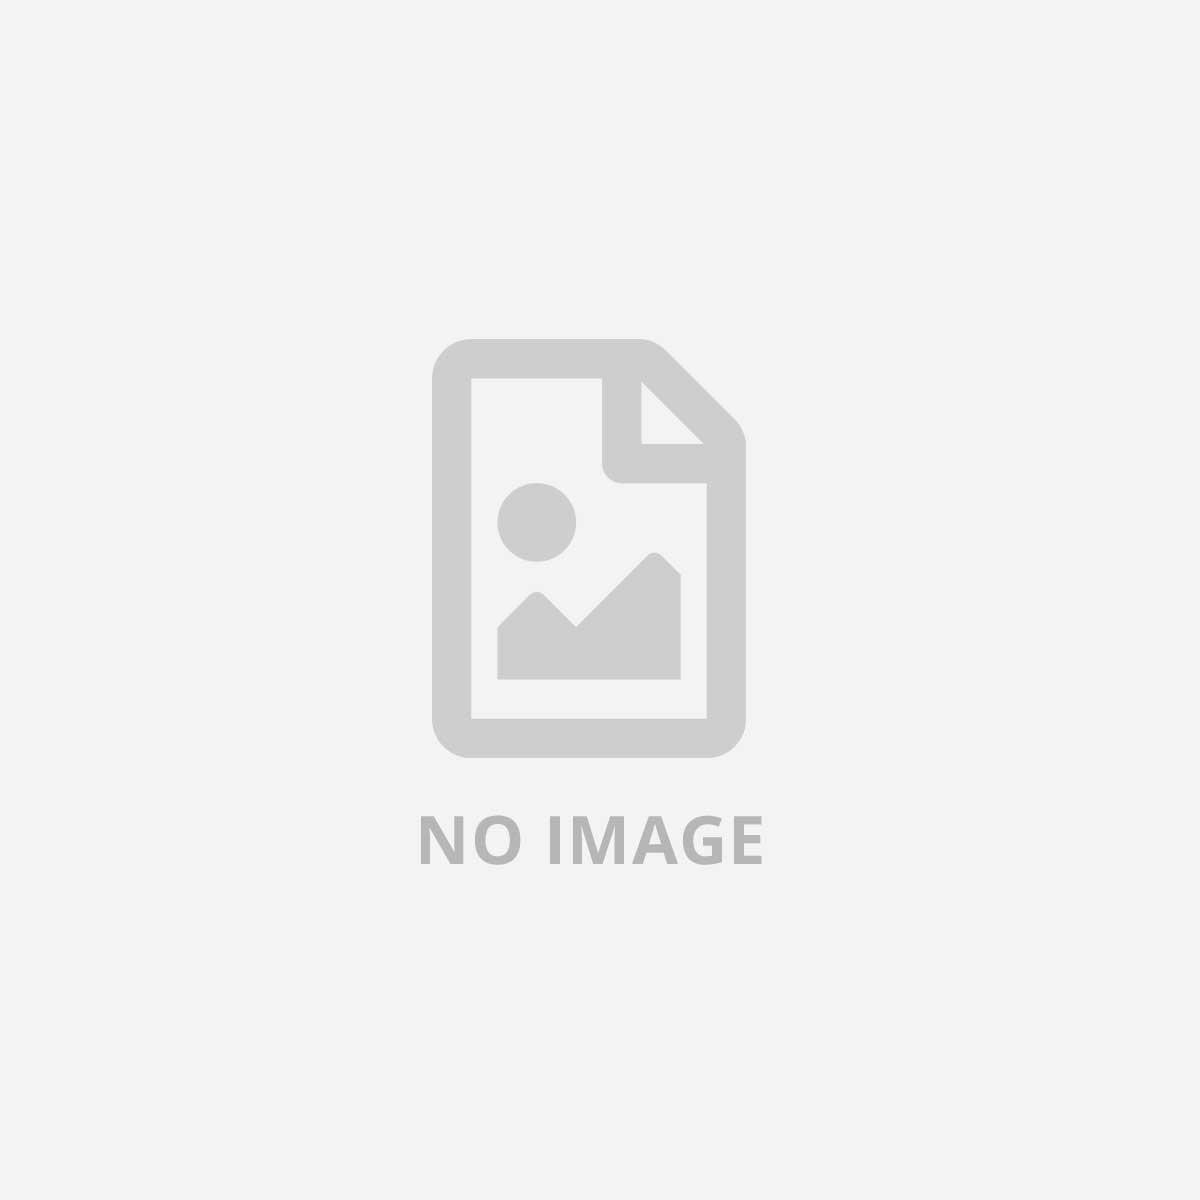 TOSHIBA HDD 3 5P 1000GB 64MB 7200RPM